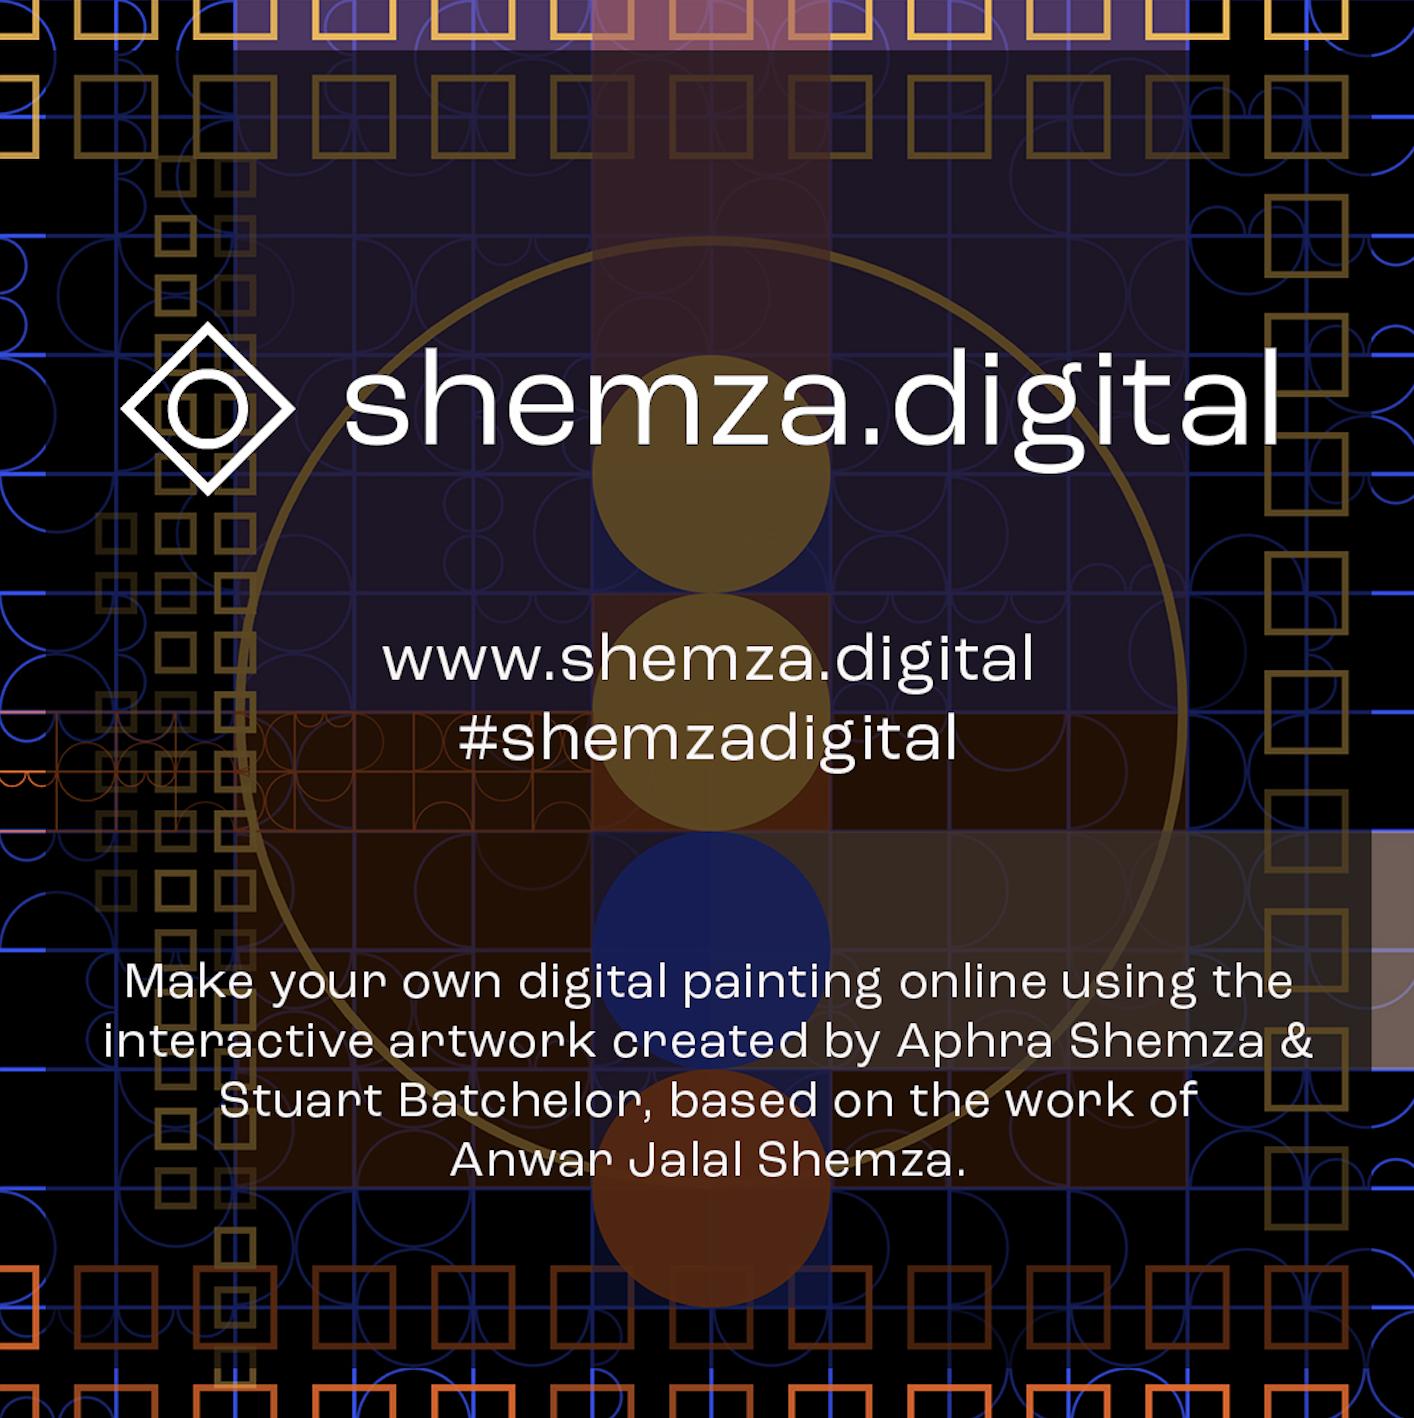 shemza.digital